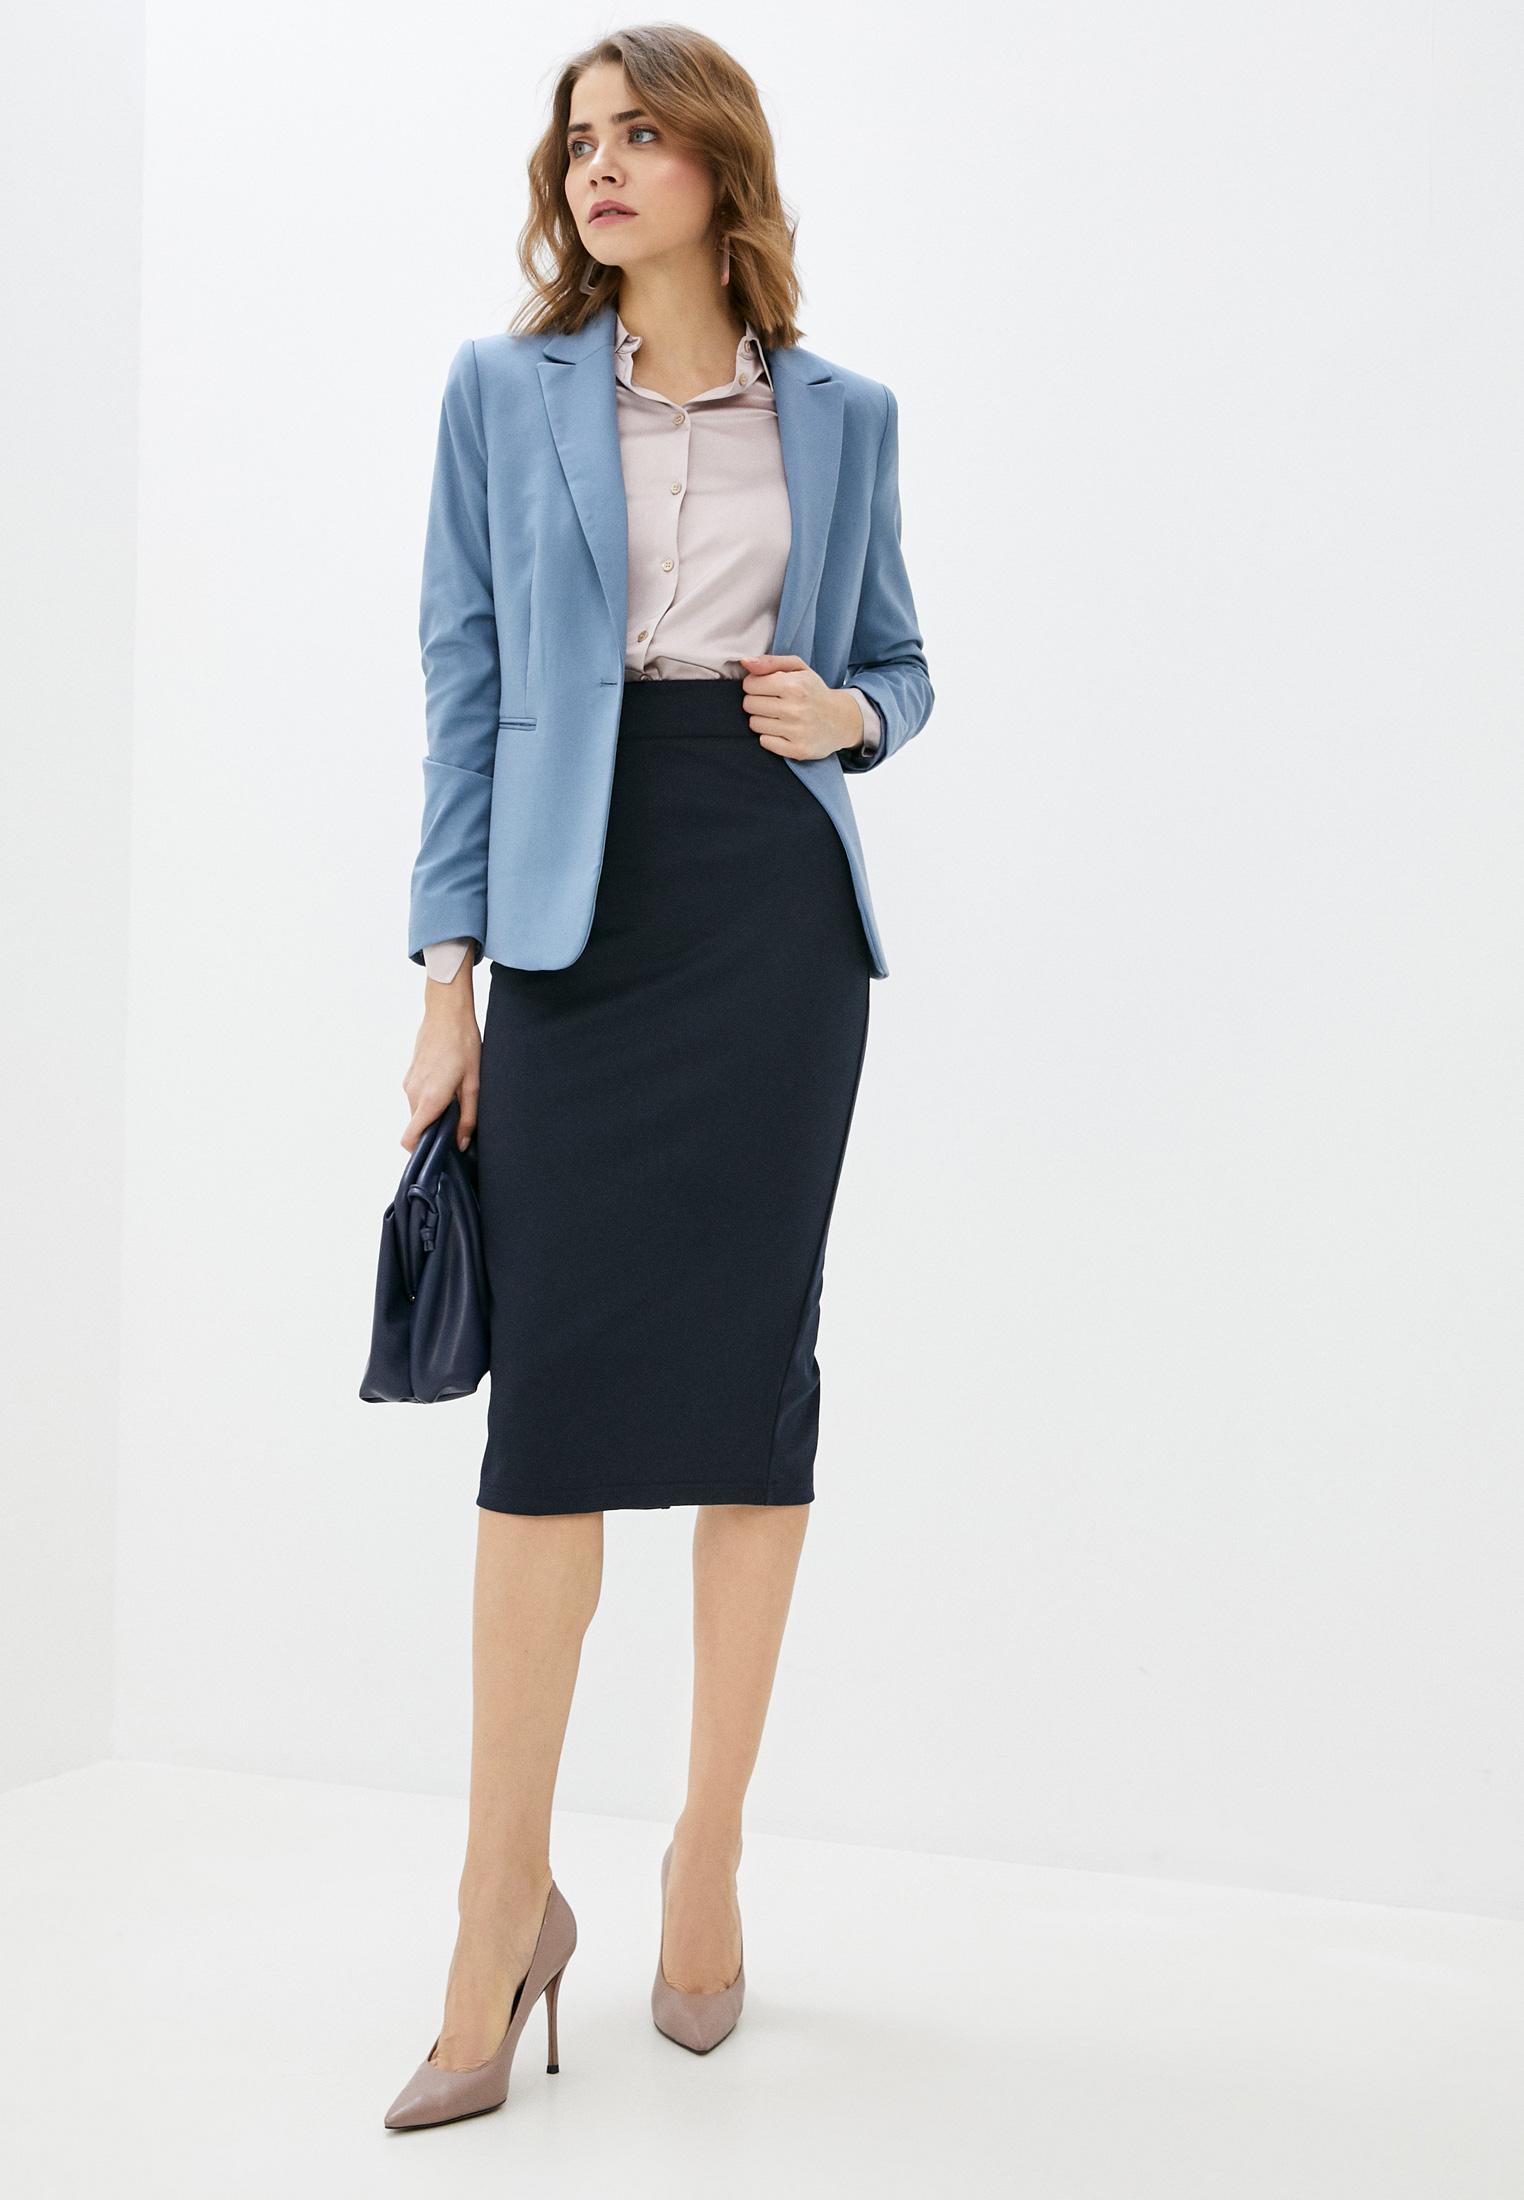 Узкая юбка Toku Tino TT8518027b/: изображение 2